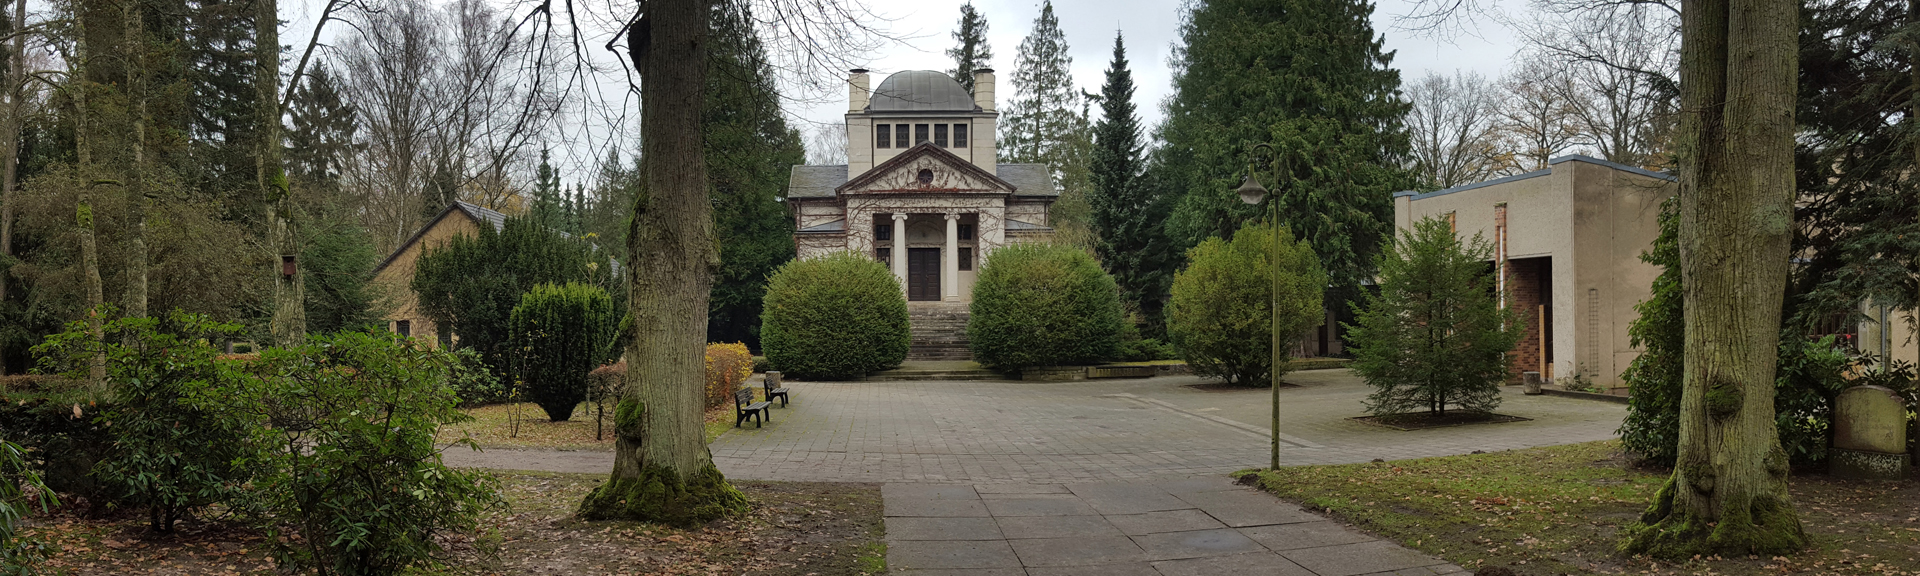 Friedhof Greifswald